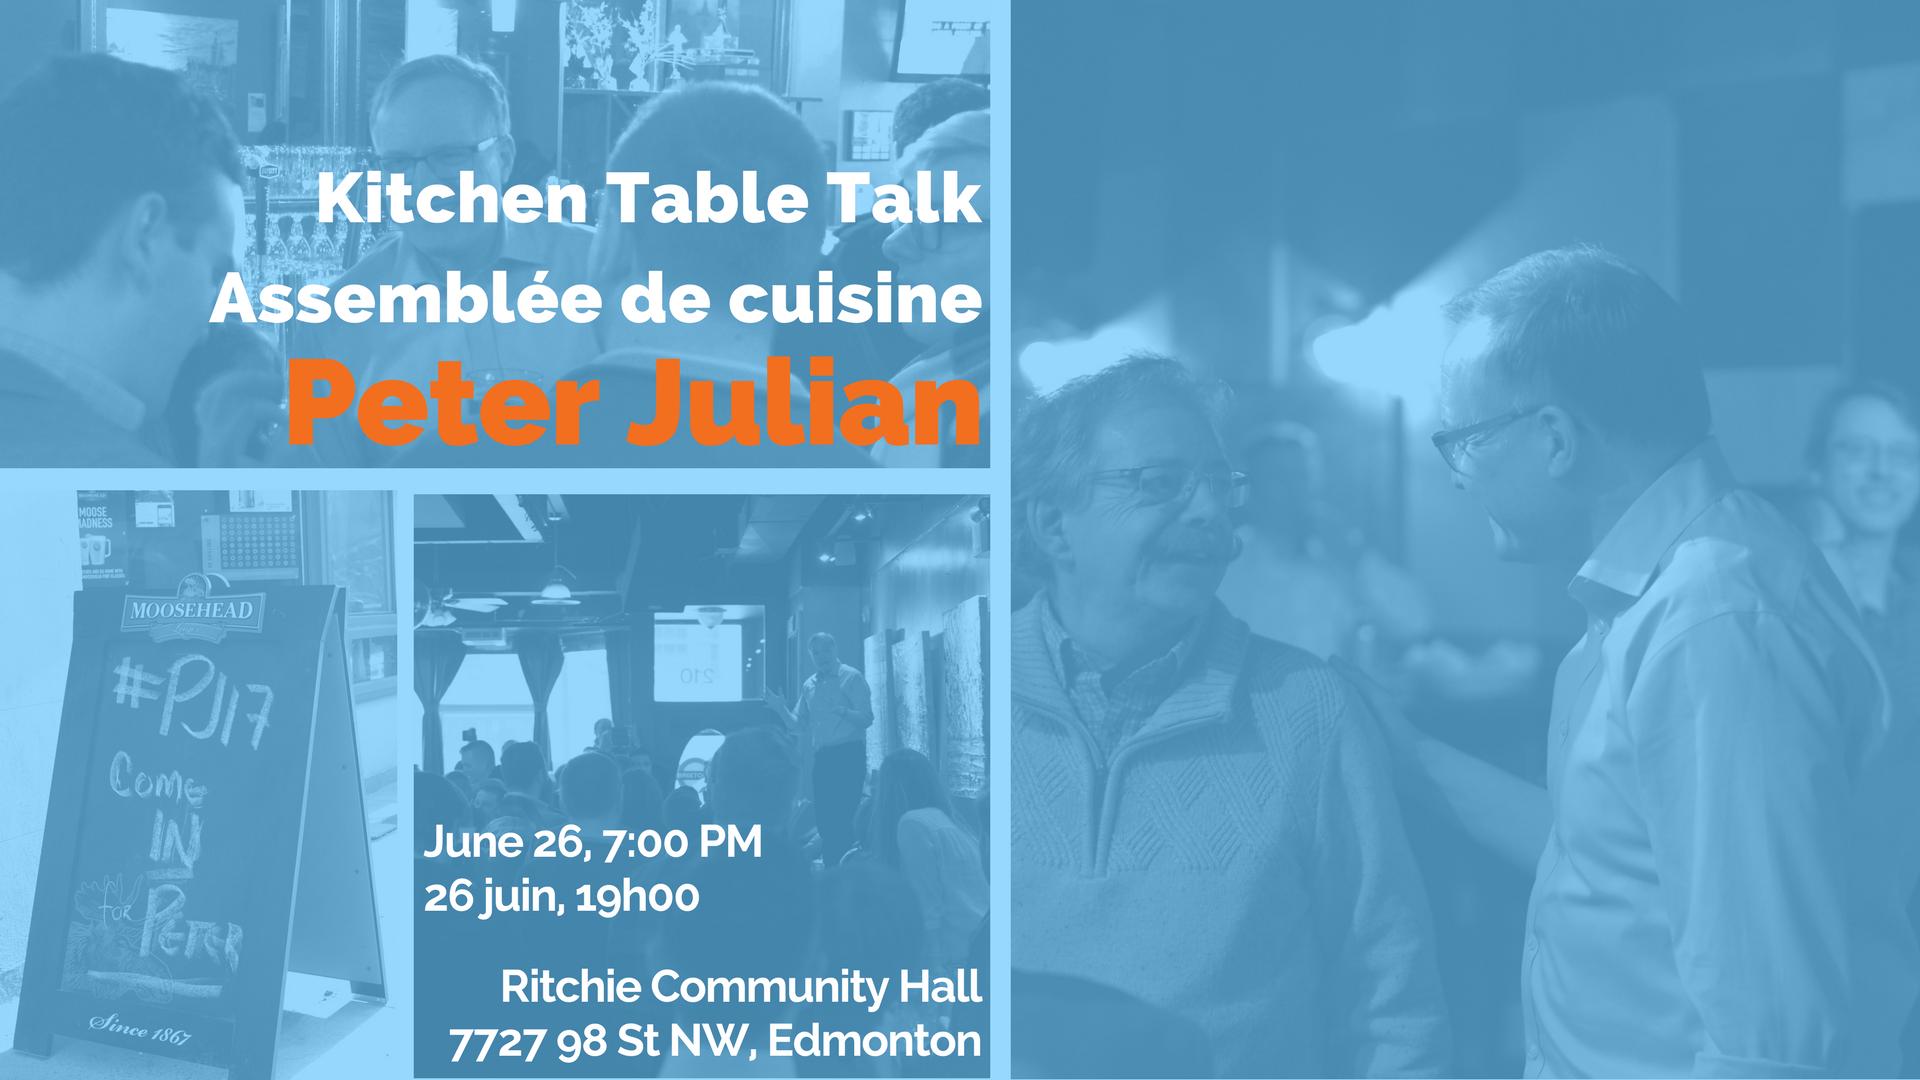 20170626_-_pj_edmonton_kitchen_table_talk.png